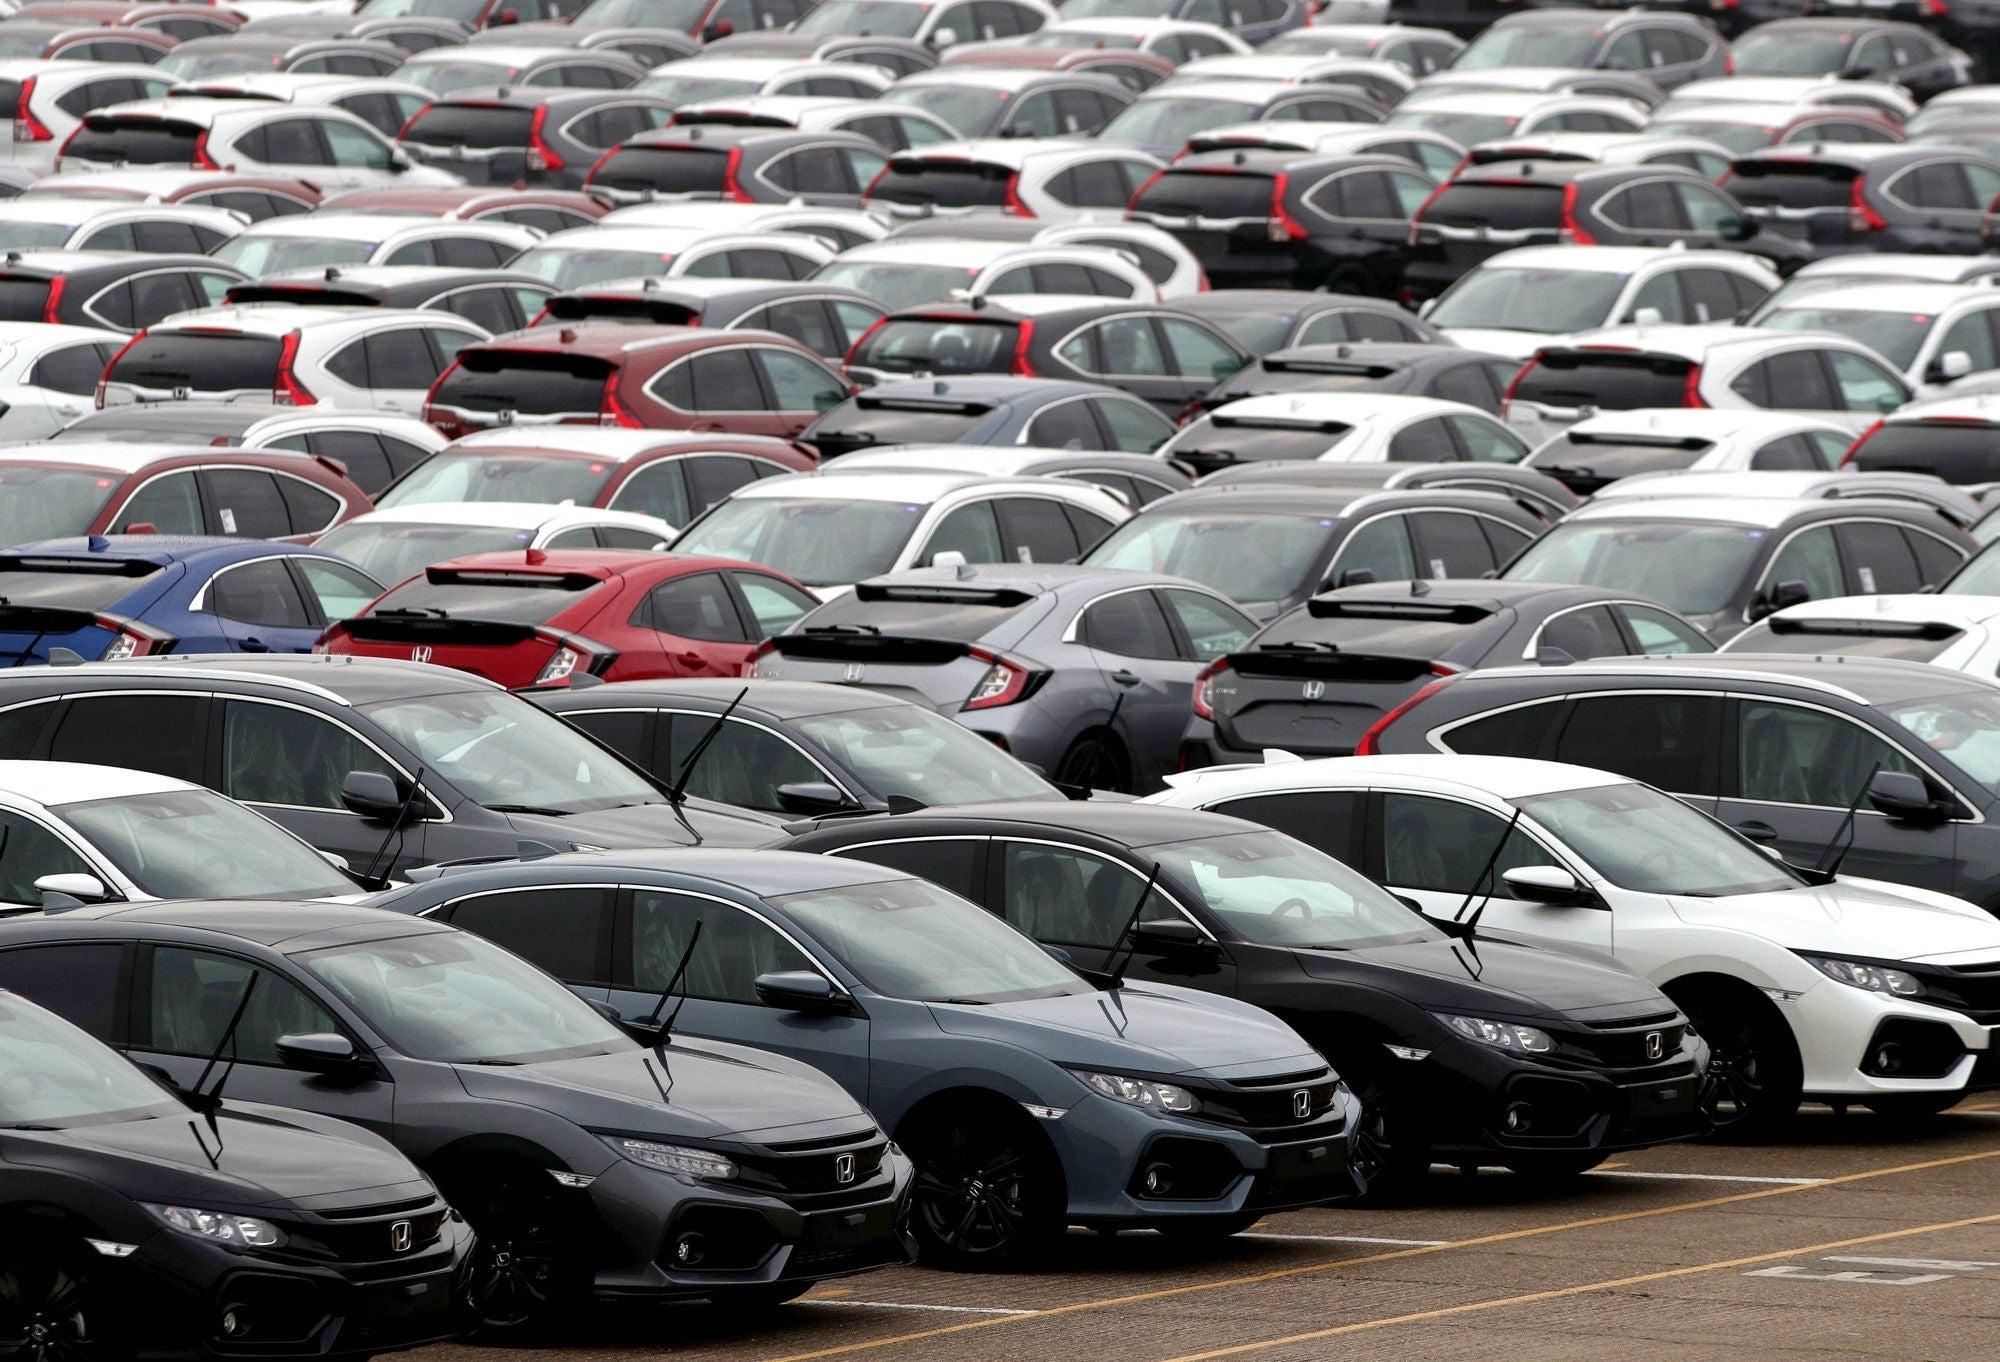 New car registrations fall by 35 per cent as coronavirus hits demand